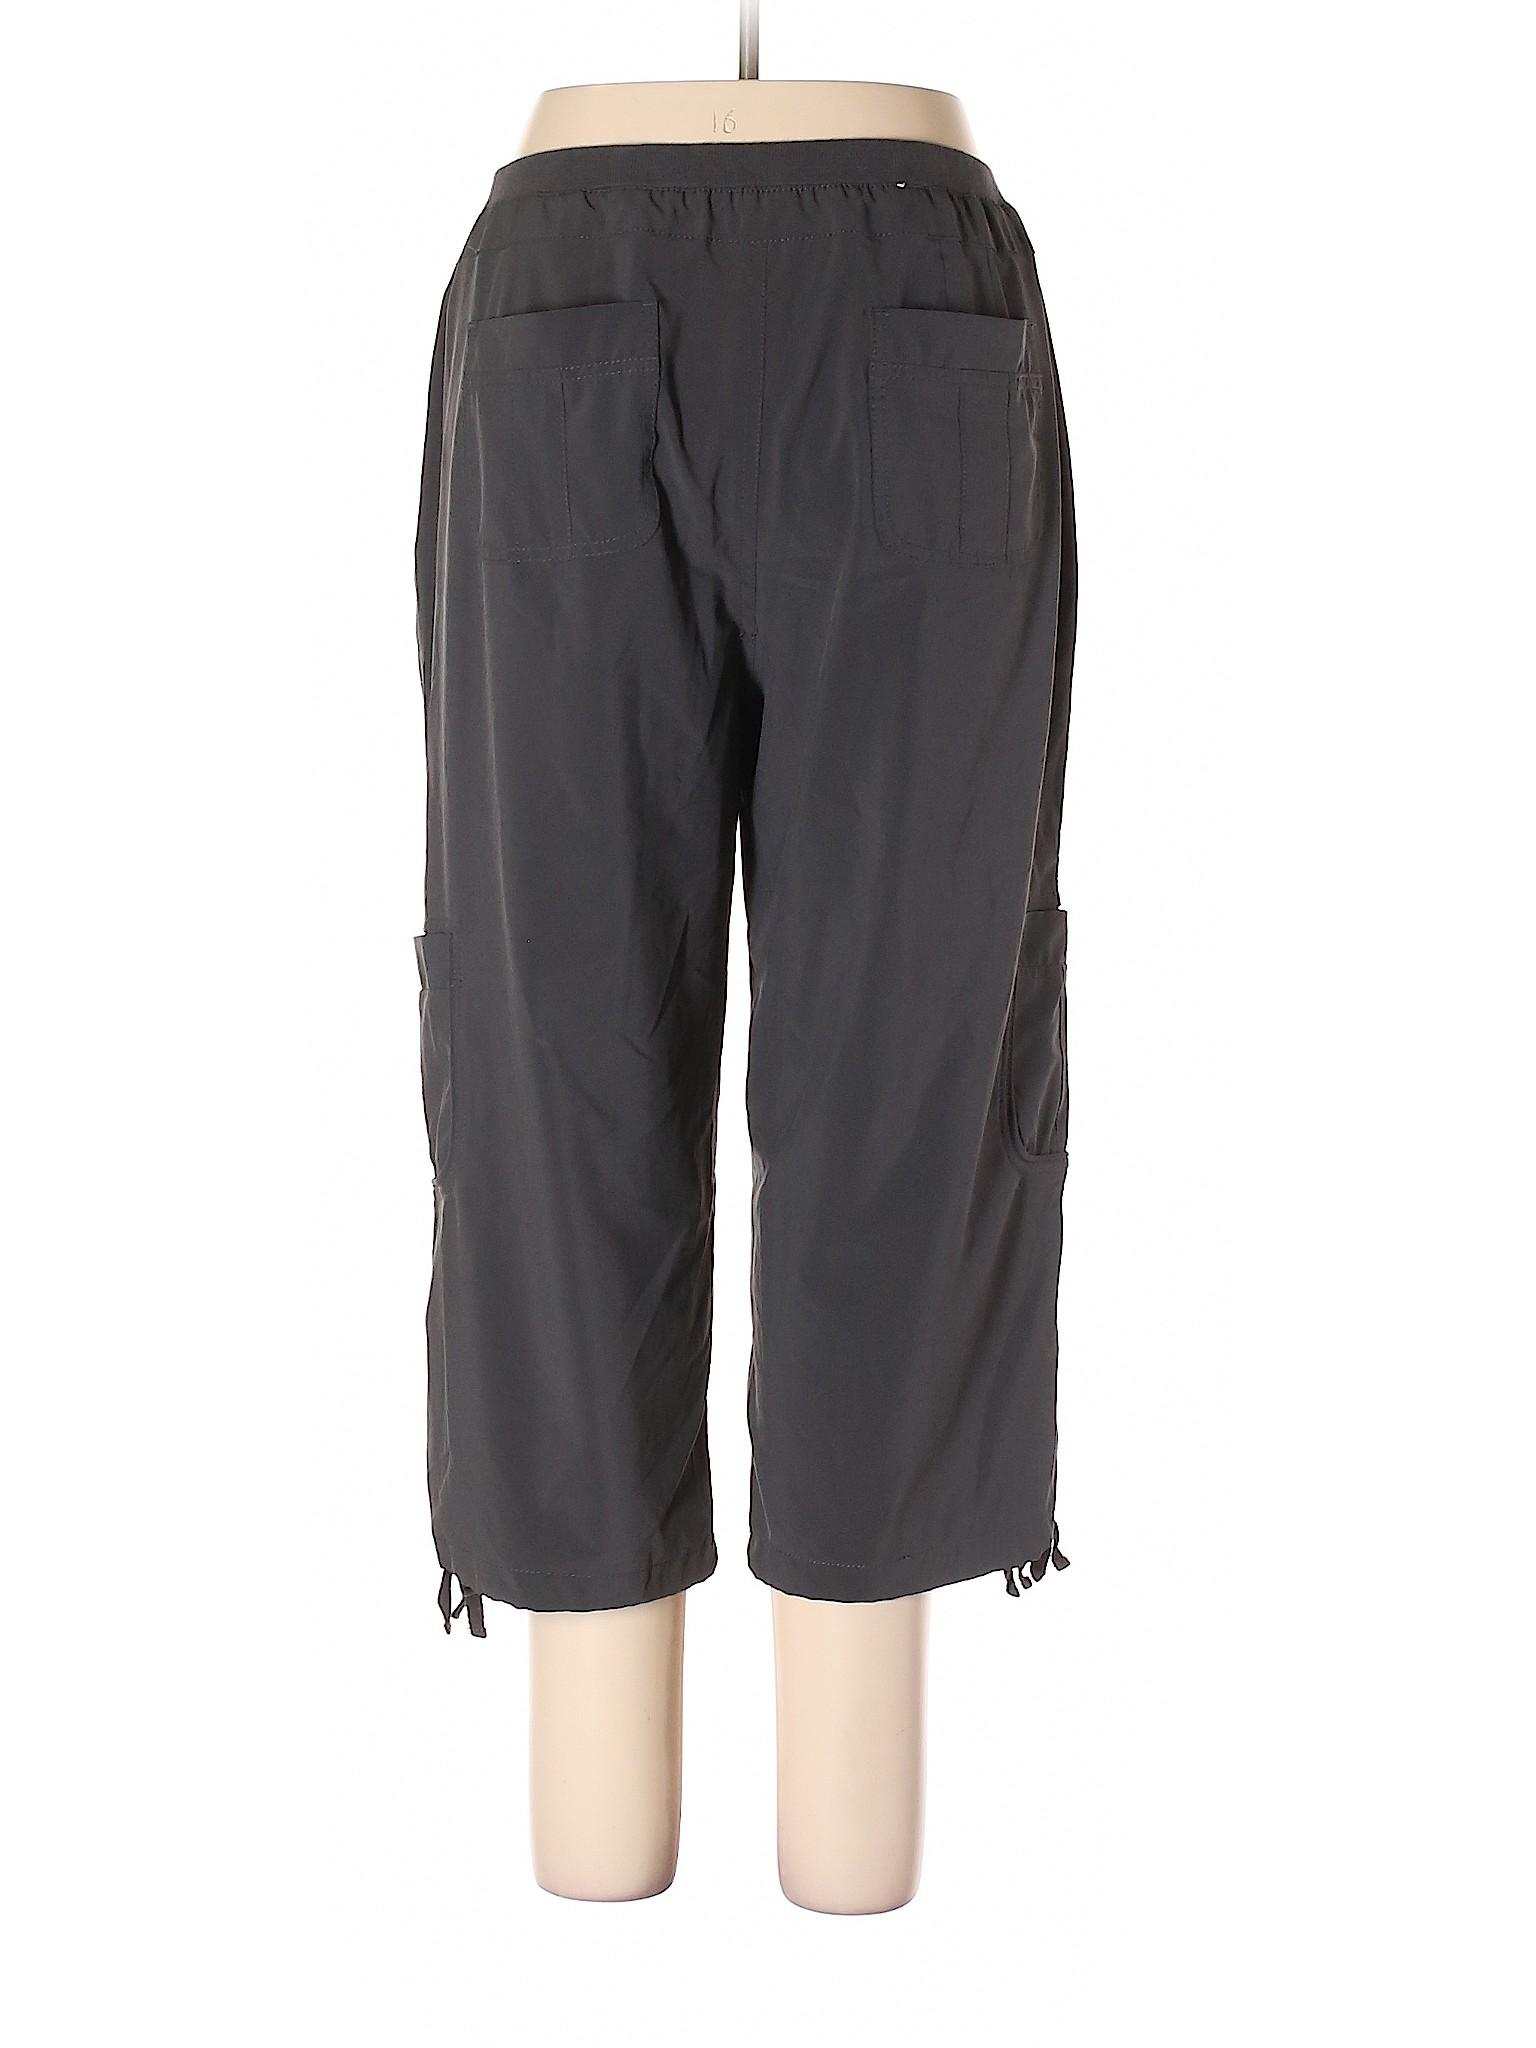 amp;Co Leisure winter Pants Cargo Style xTwARwqX